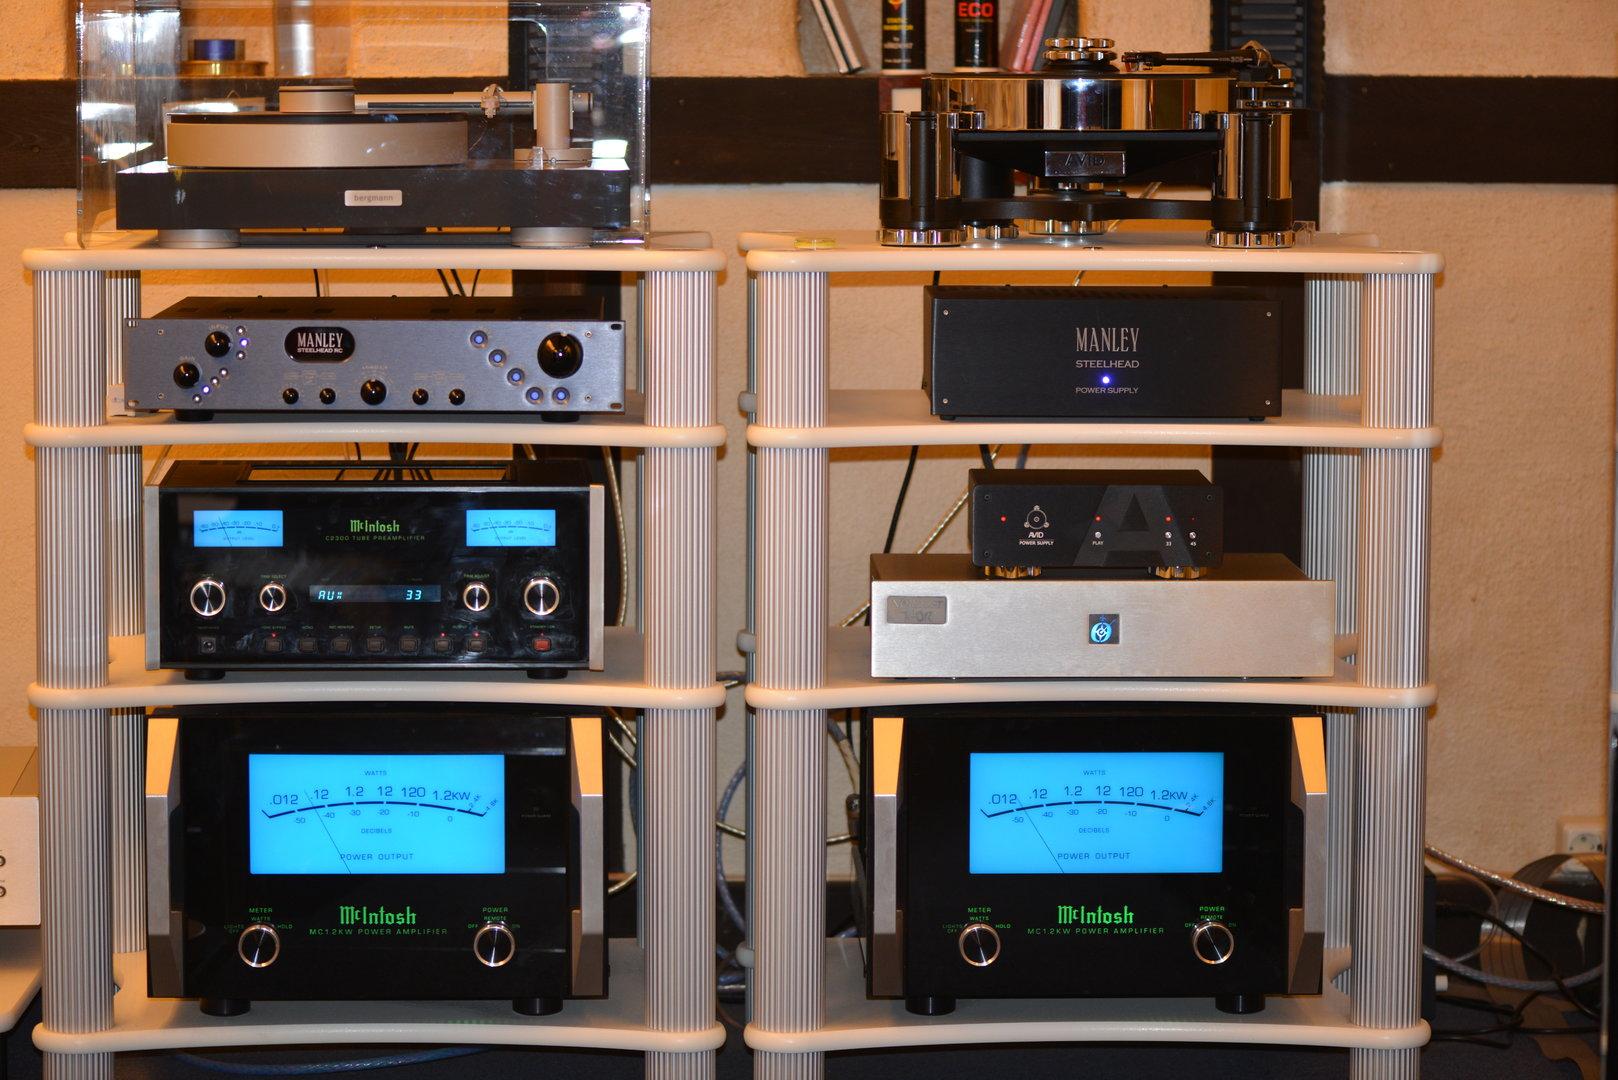 Mc. & to dyre vinylrigger 001.JPG